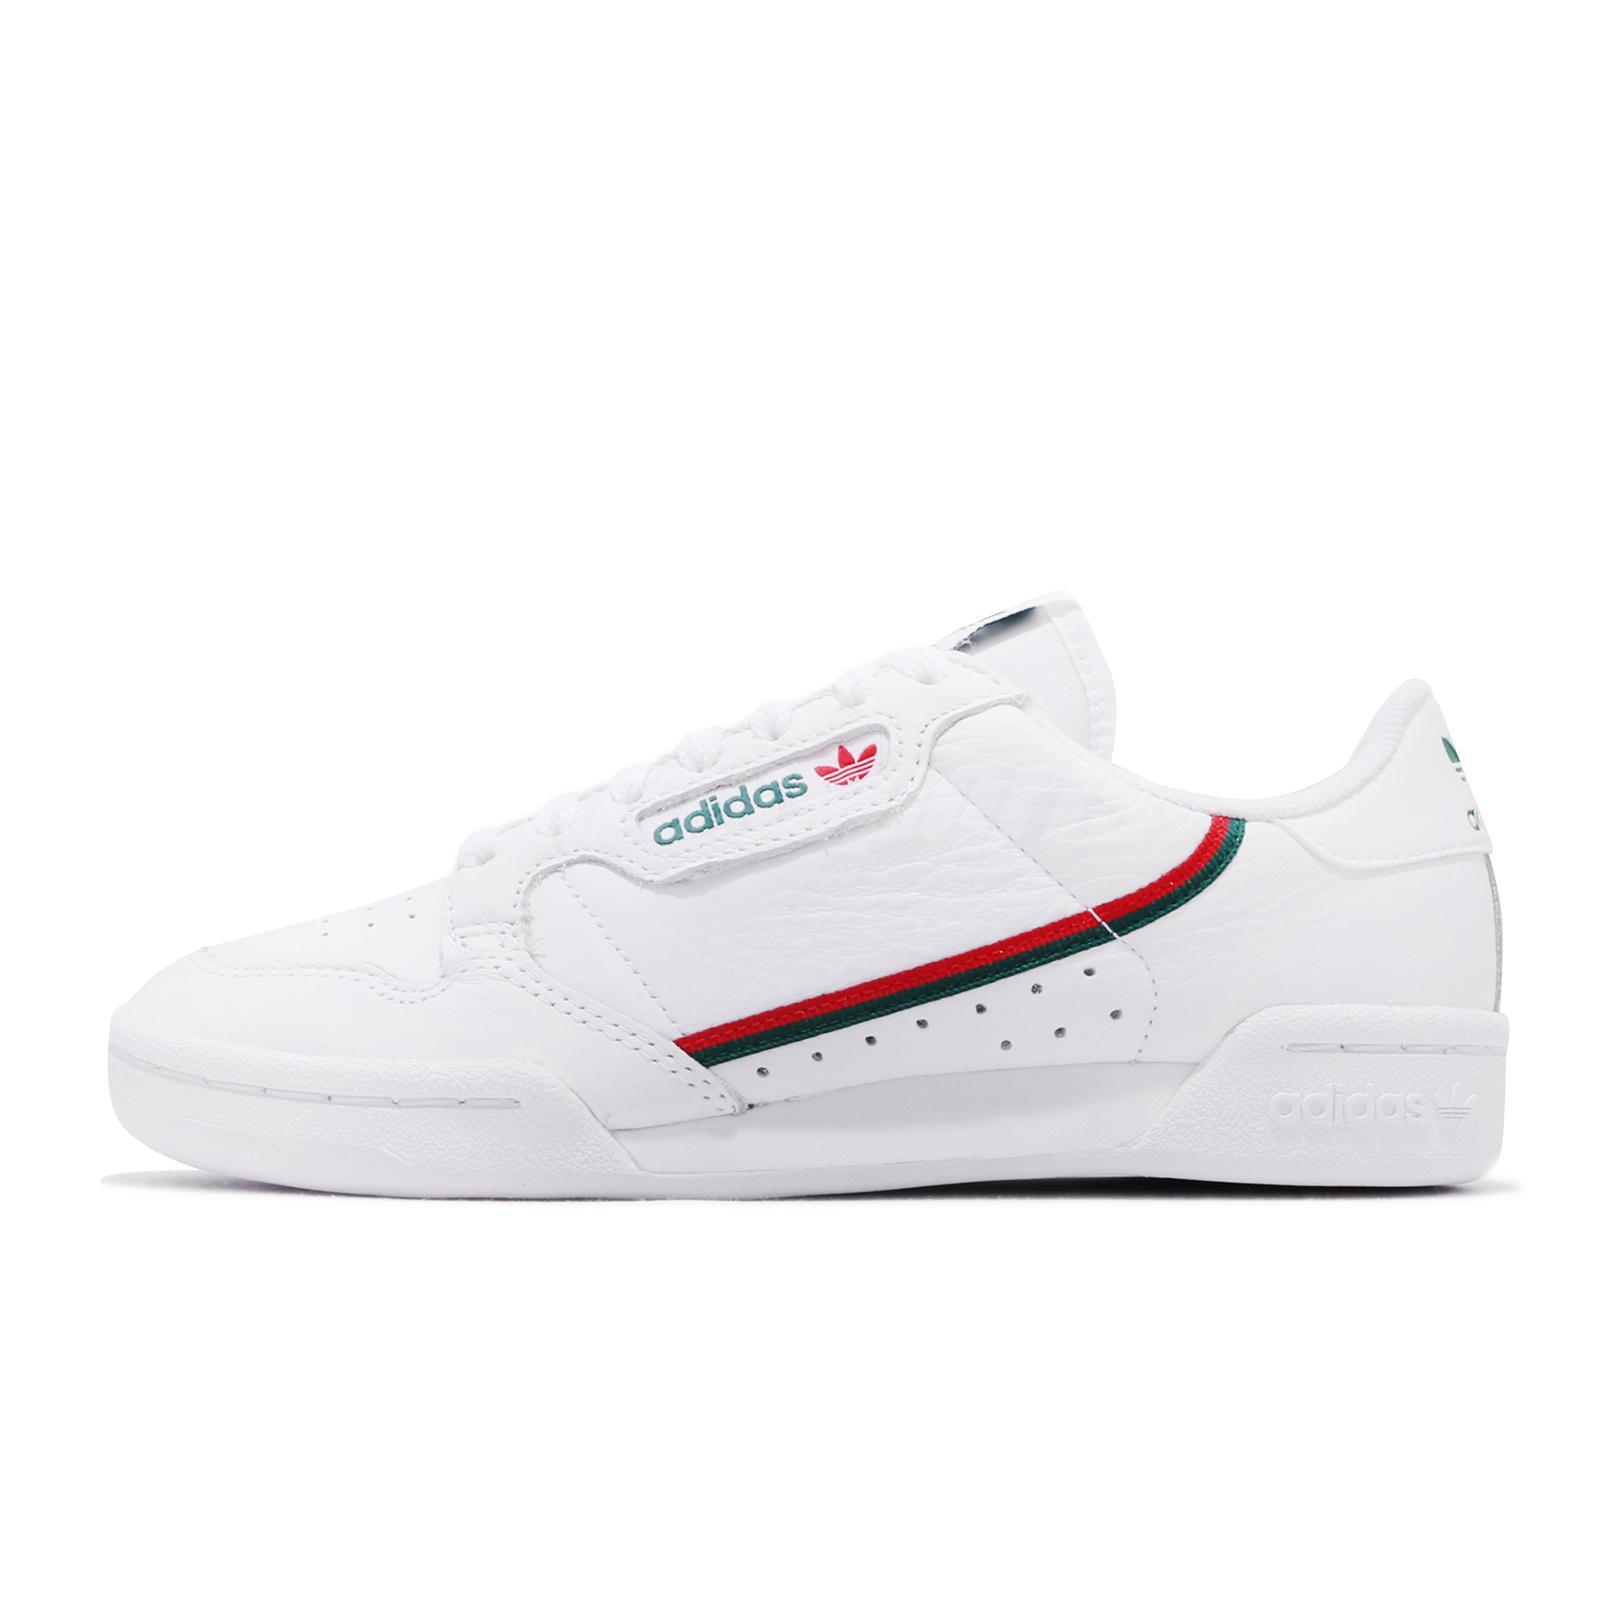 asics womens lifestyle shoes 80